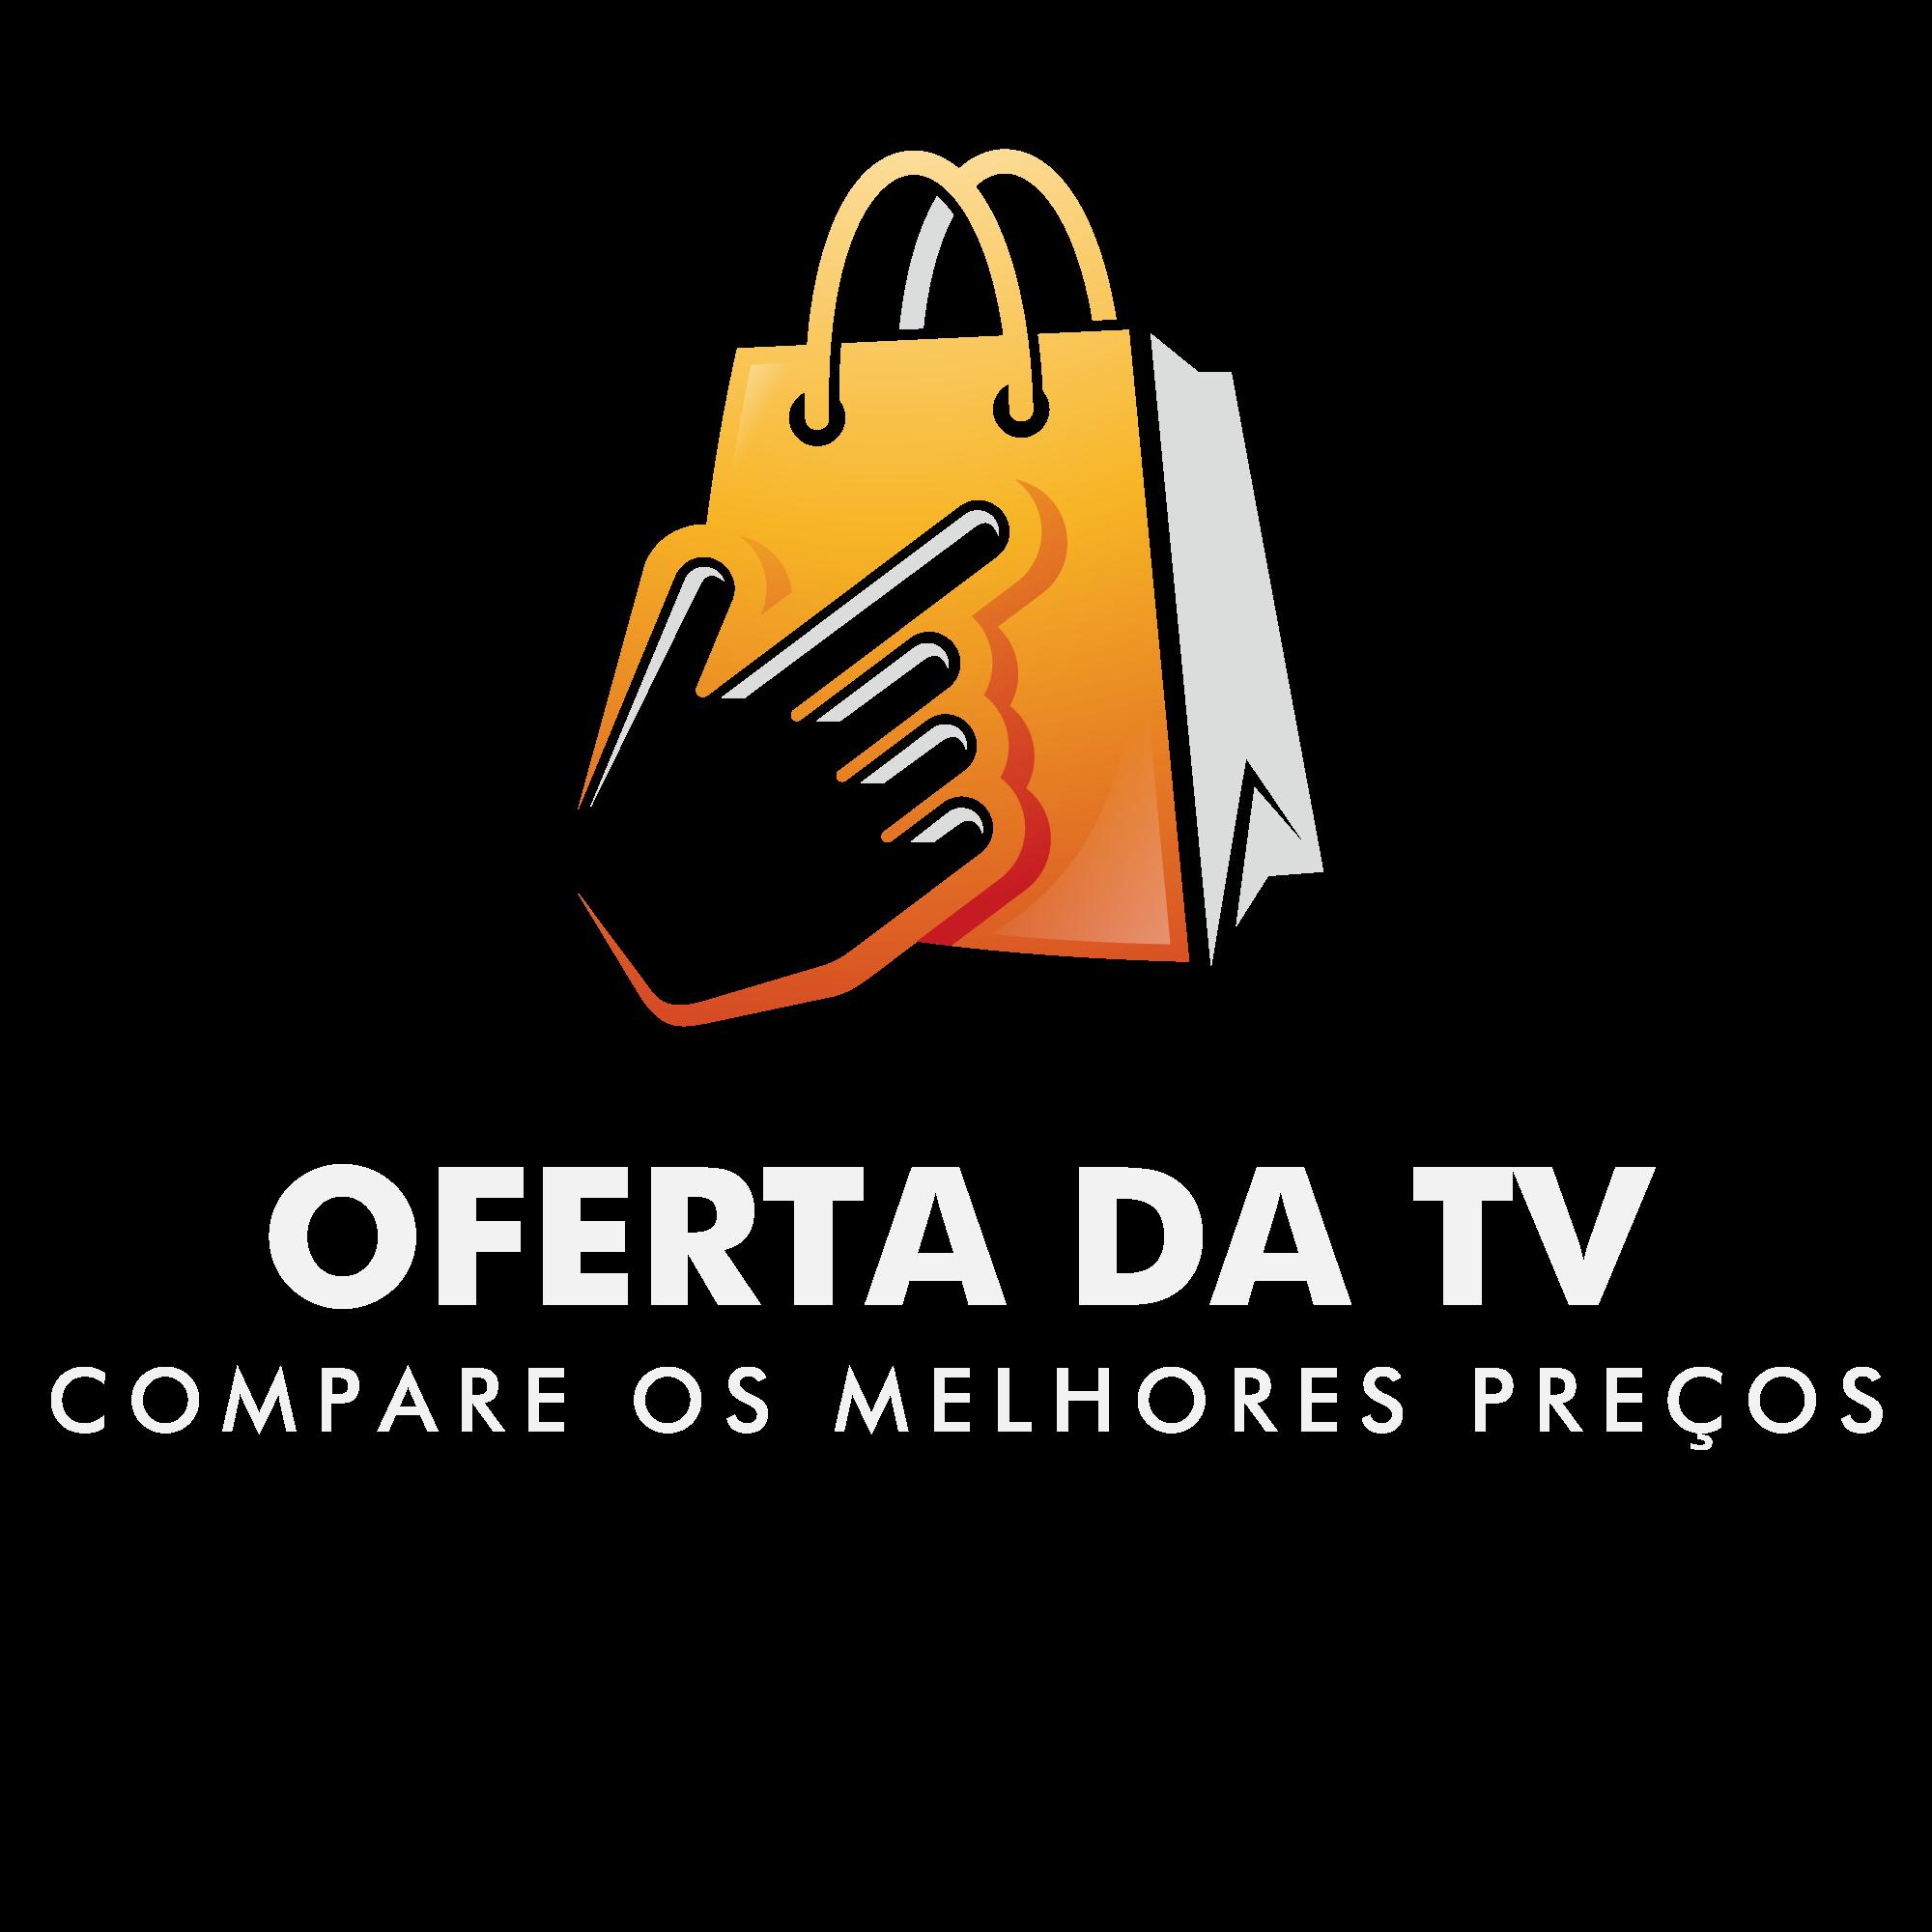 Oferta da TV - TV Barbacena